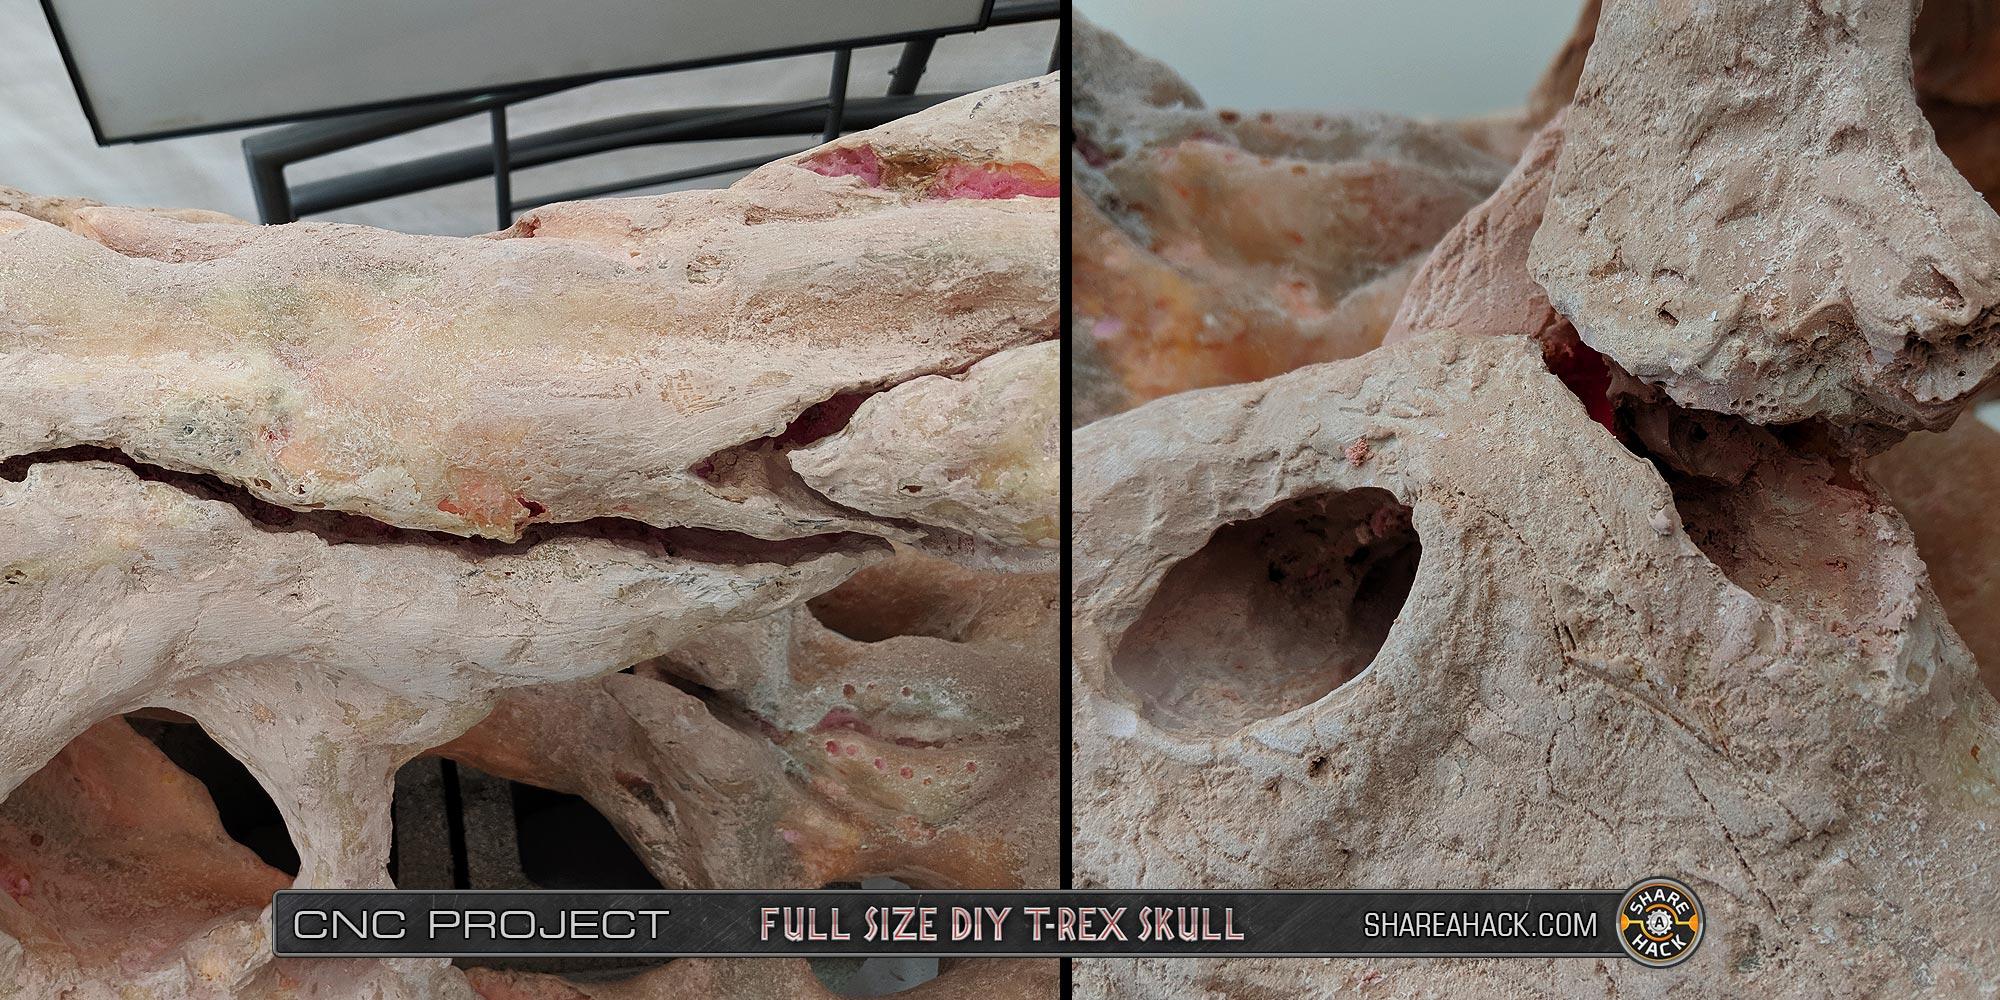 x-skull-cnc-foam_3dmodel_43-real-trex-fossil-skull.jpg